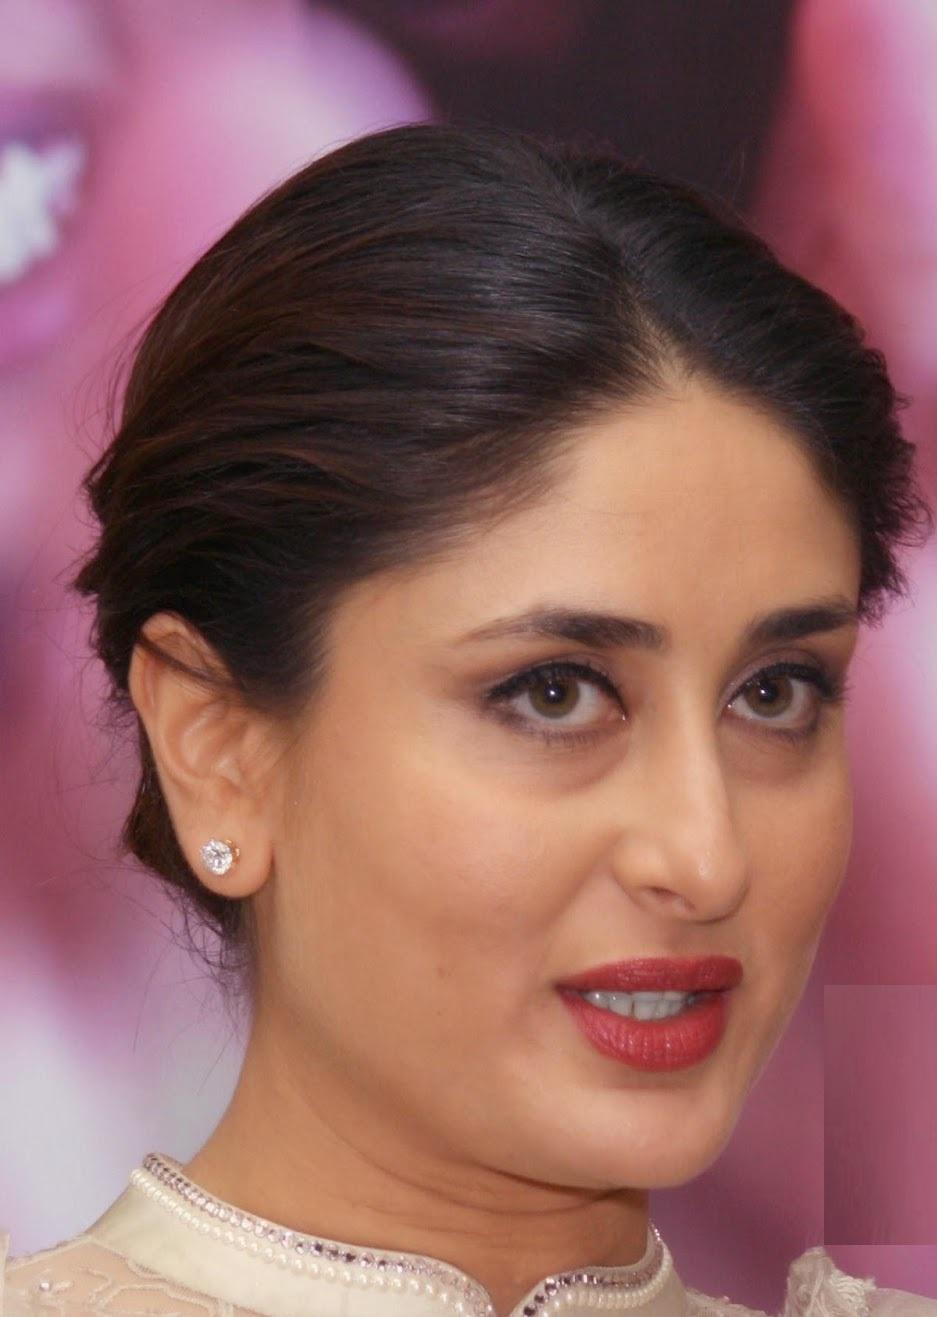 kareena kapoor spicy hot face close up photos - tollywood stars